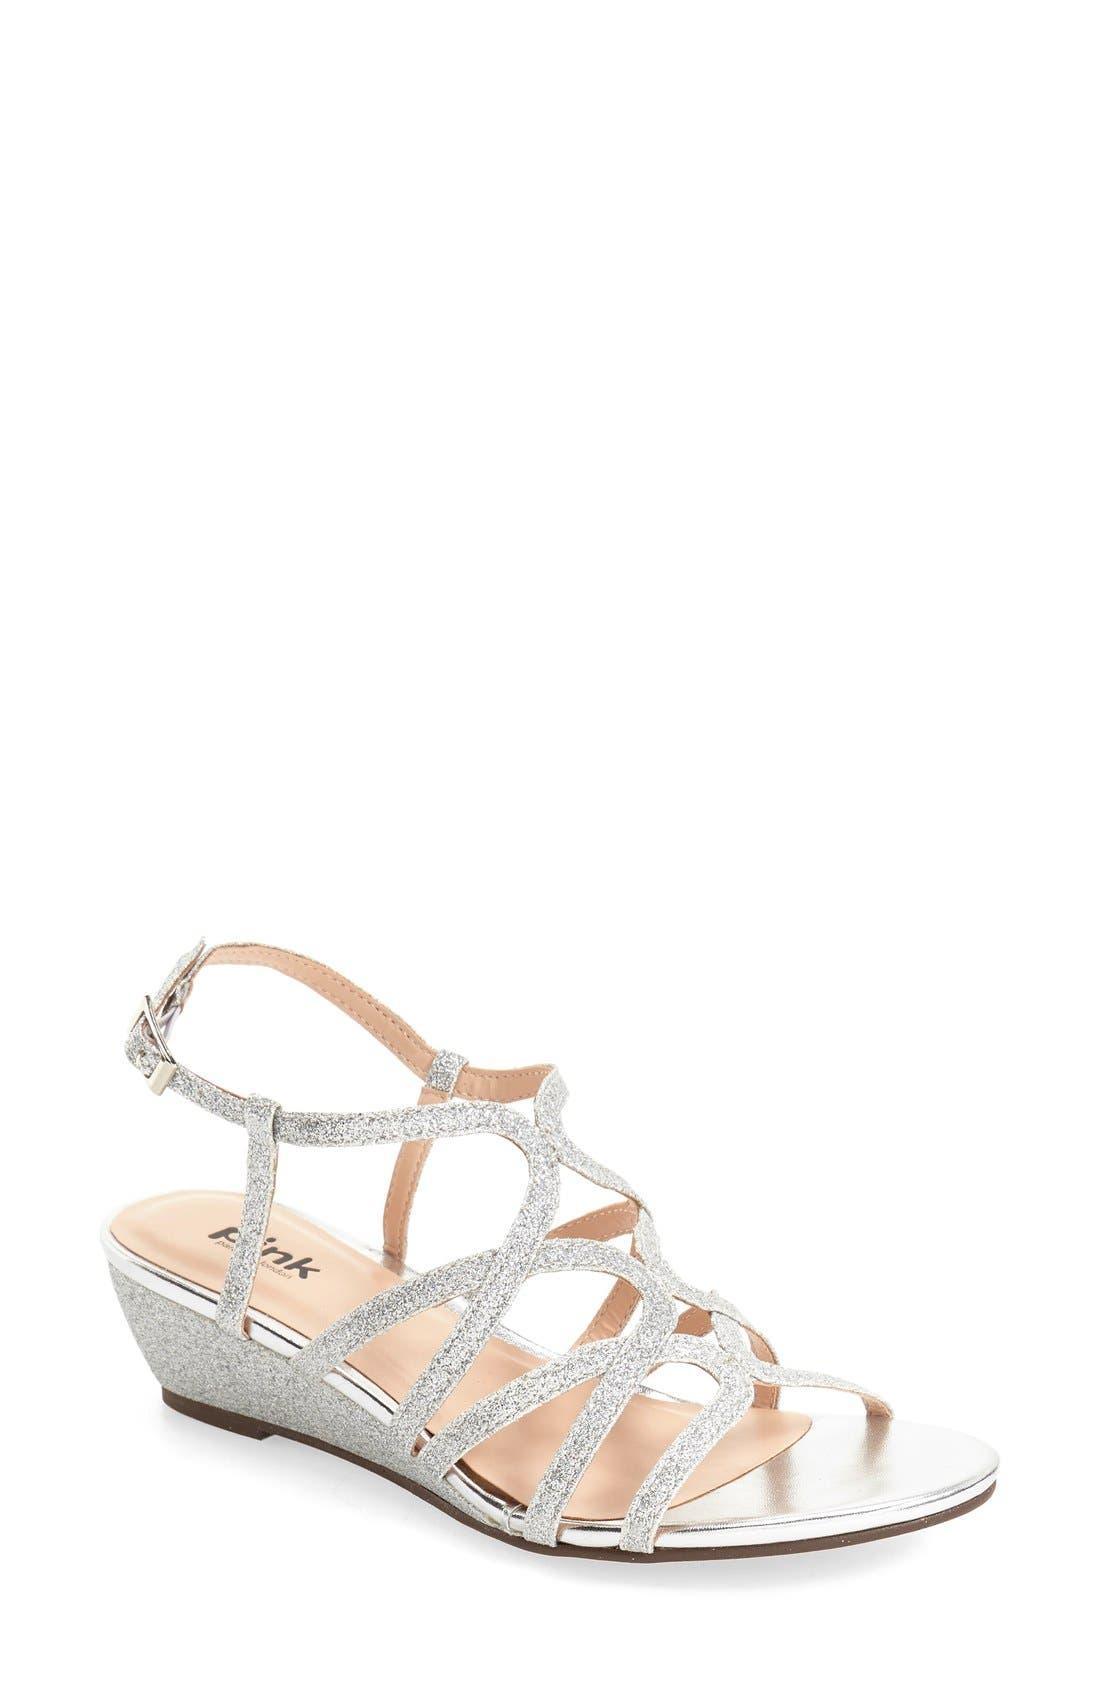 'Opulent' Wedge Sandal,                             Main thumbnail 1, color,                             Silver